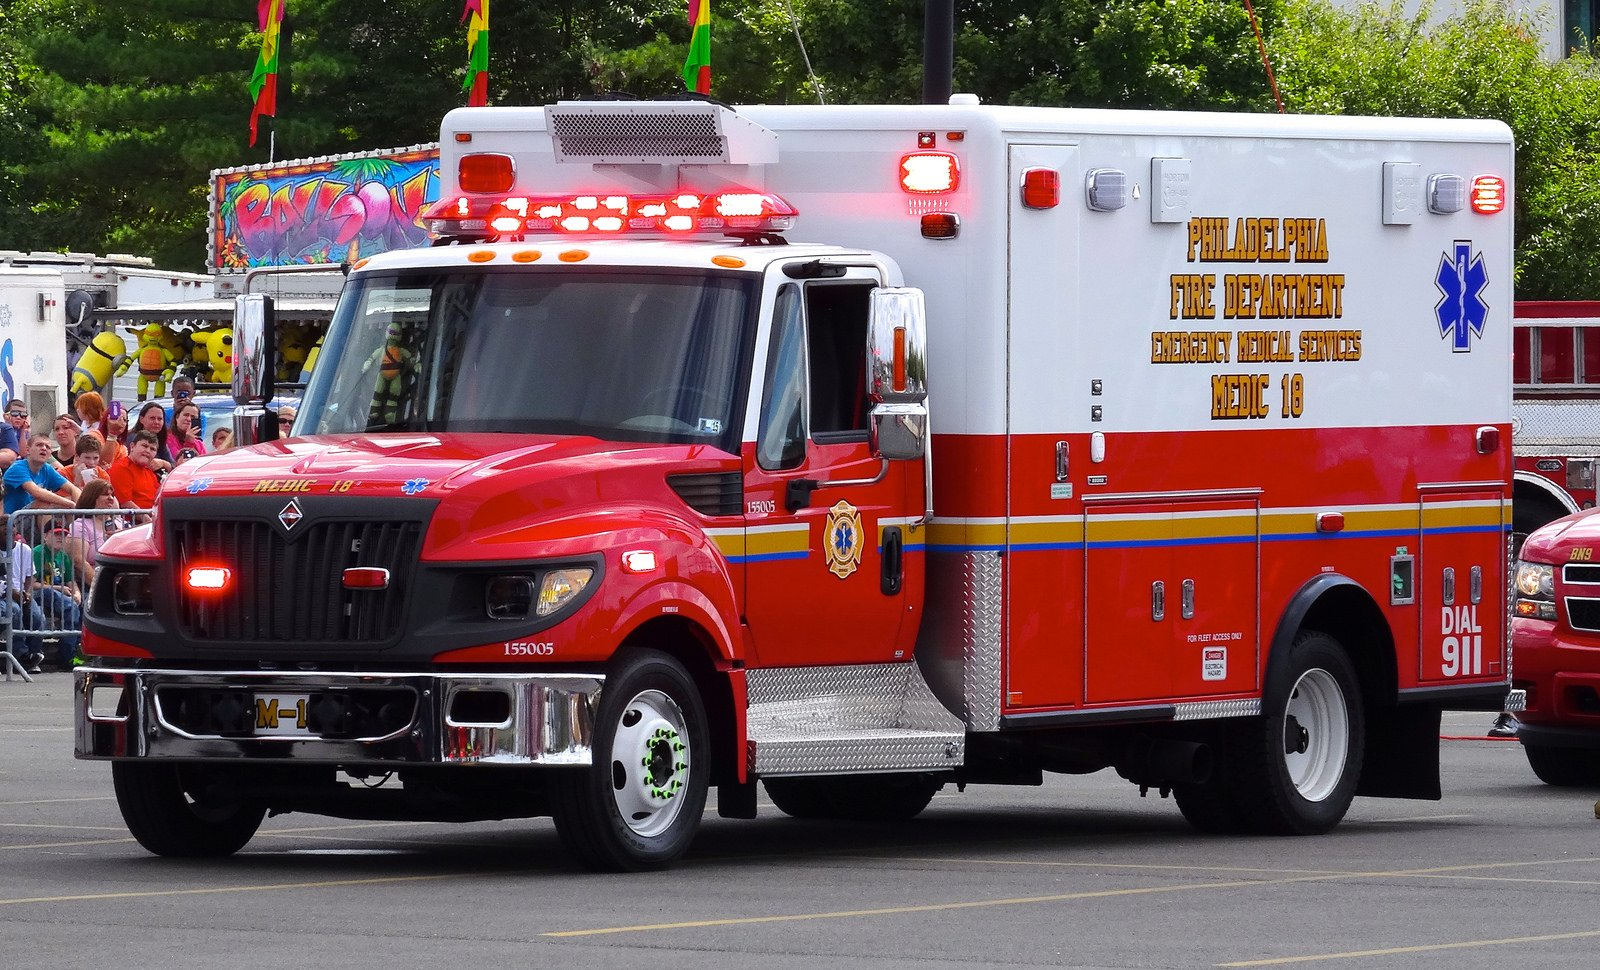 Fire department wallpapers wallpapersafari - Camion pompier cars ...